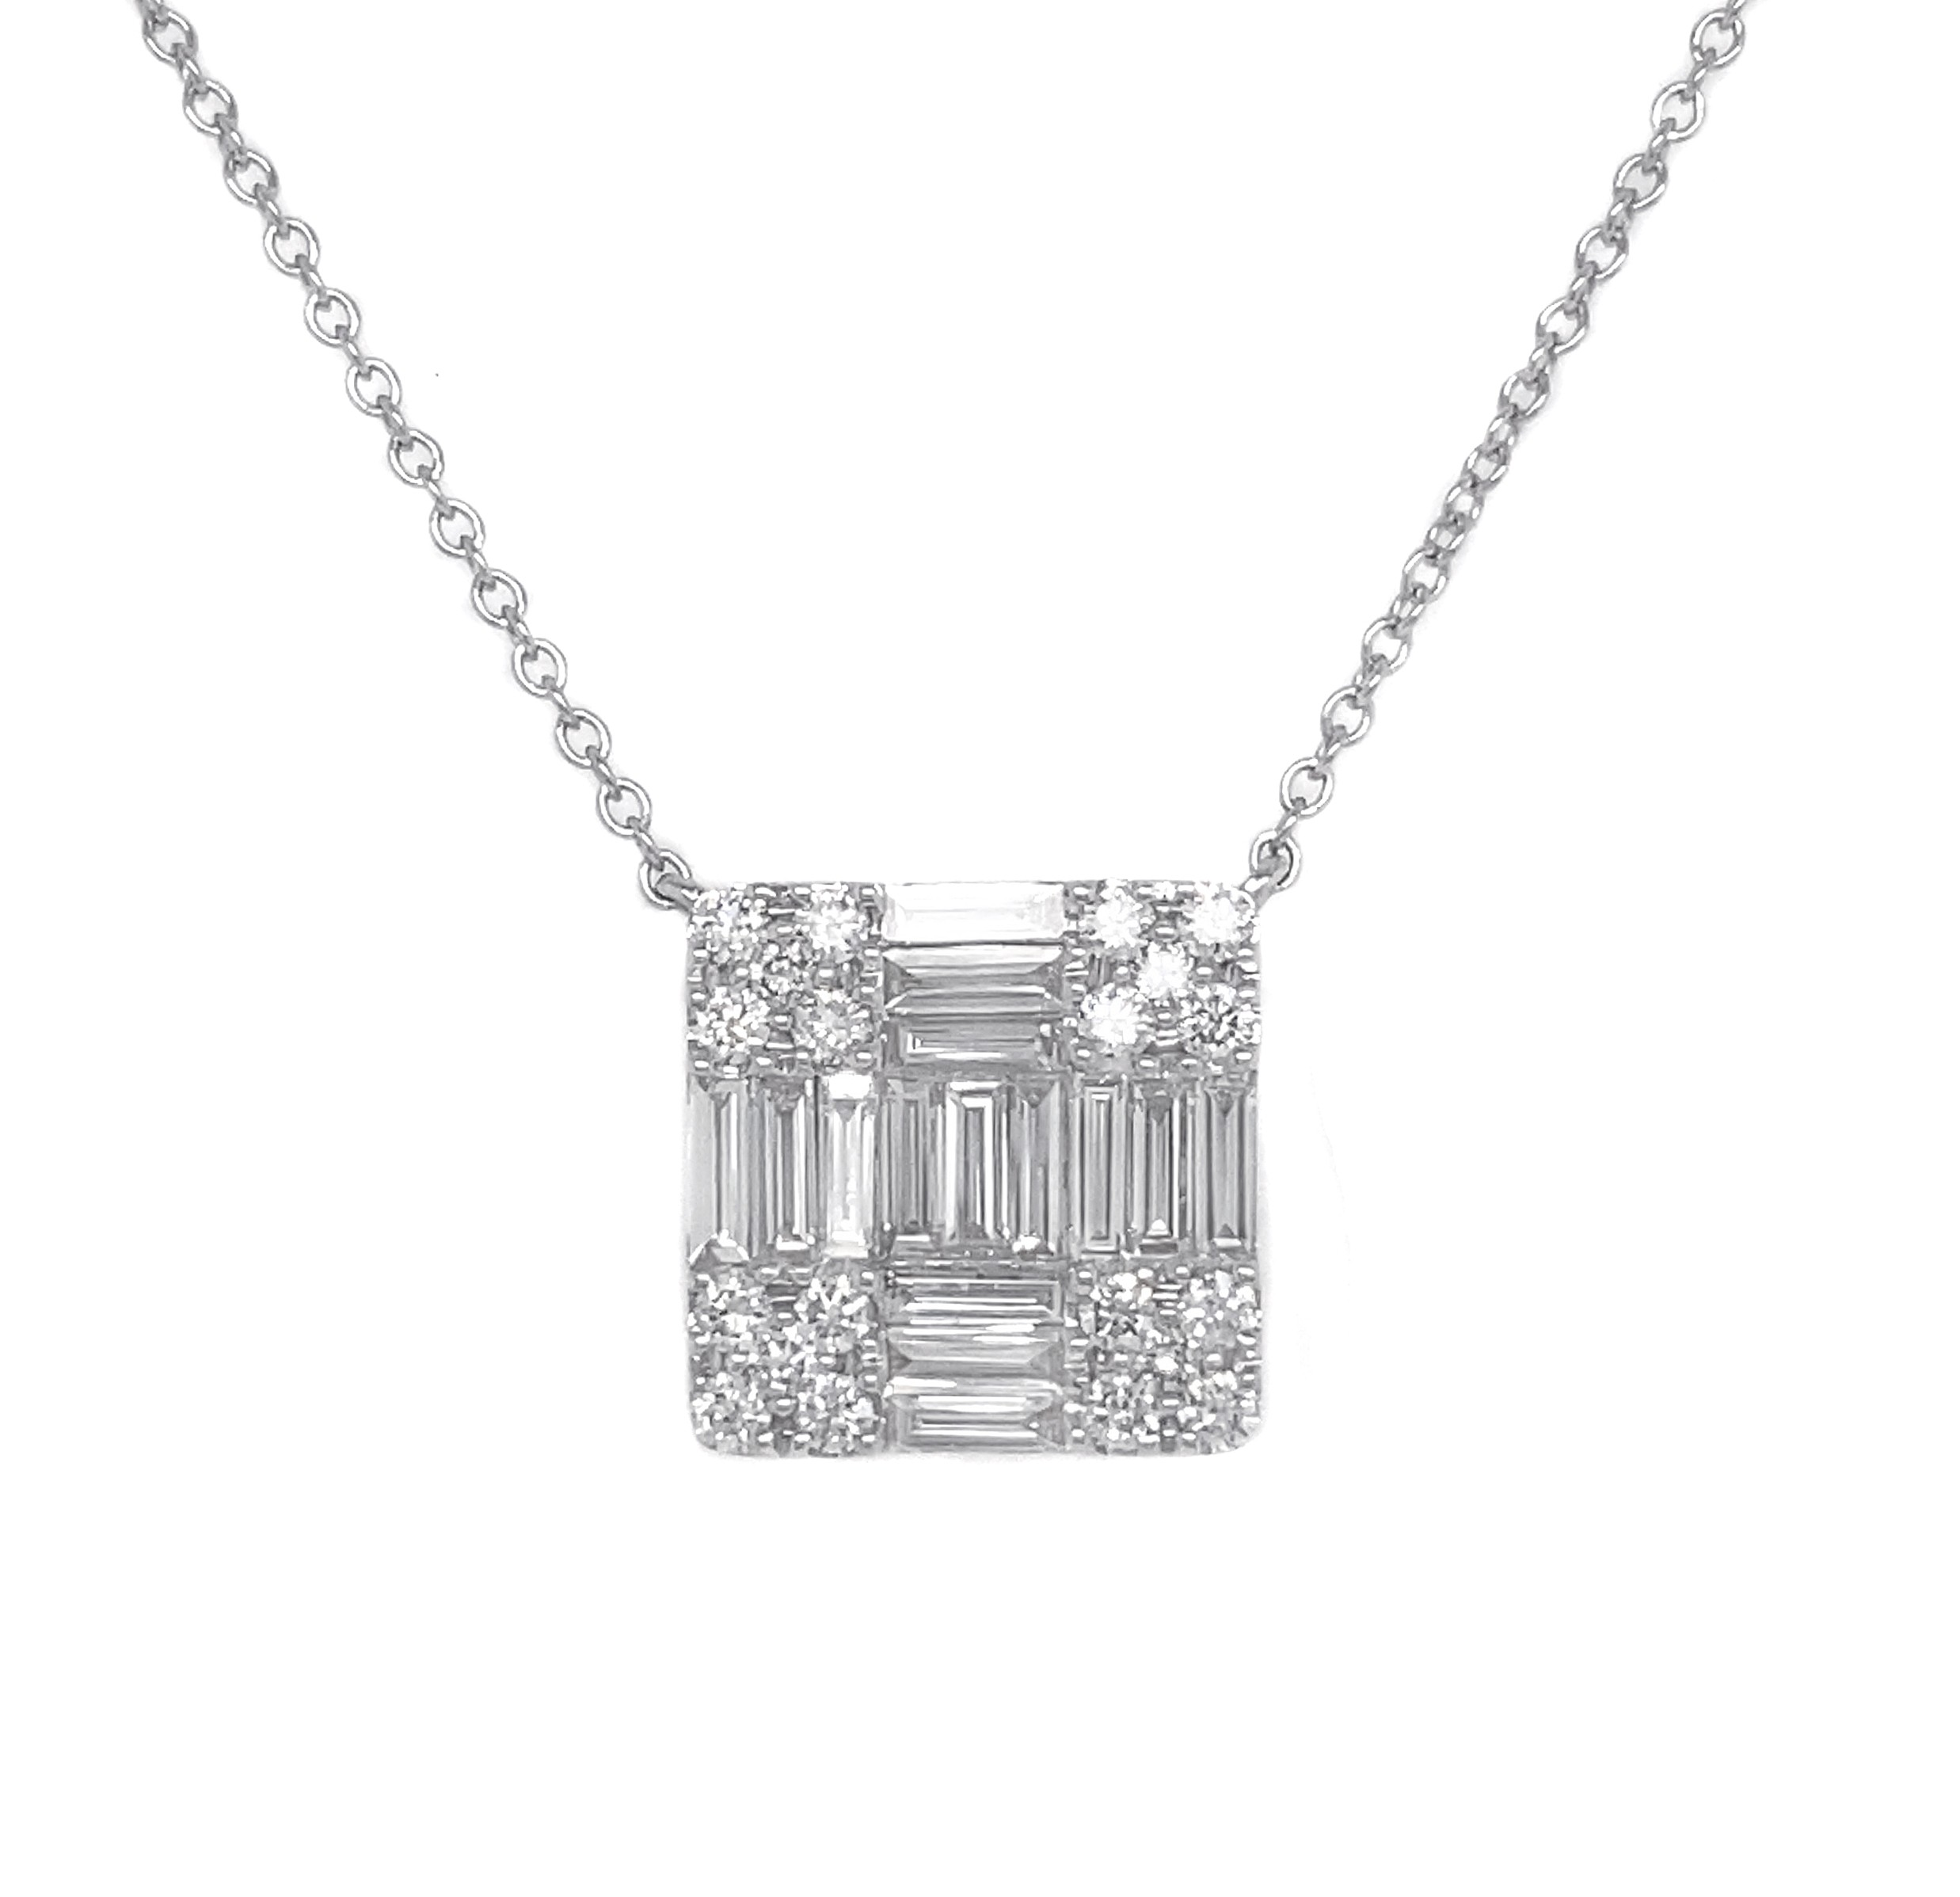 18kt White Gold Diamond Pendant